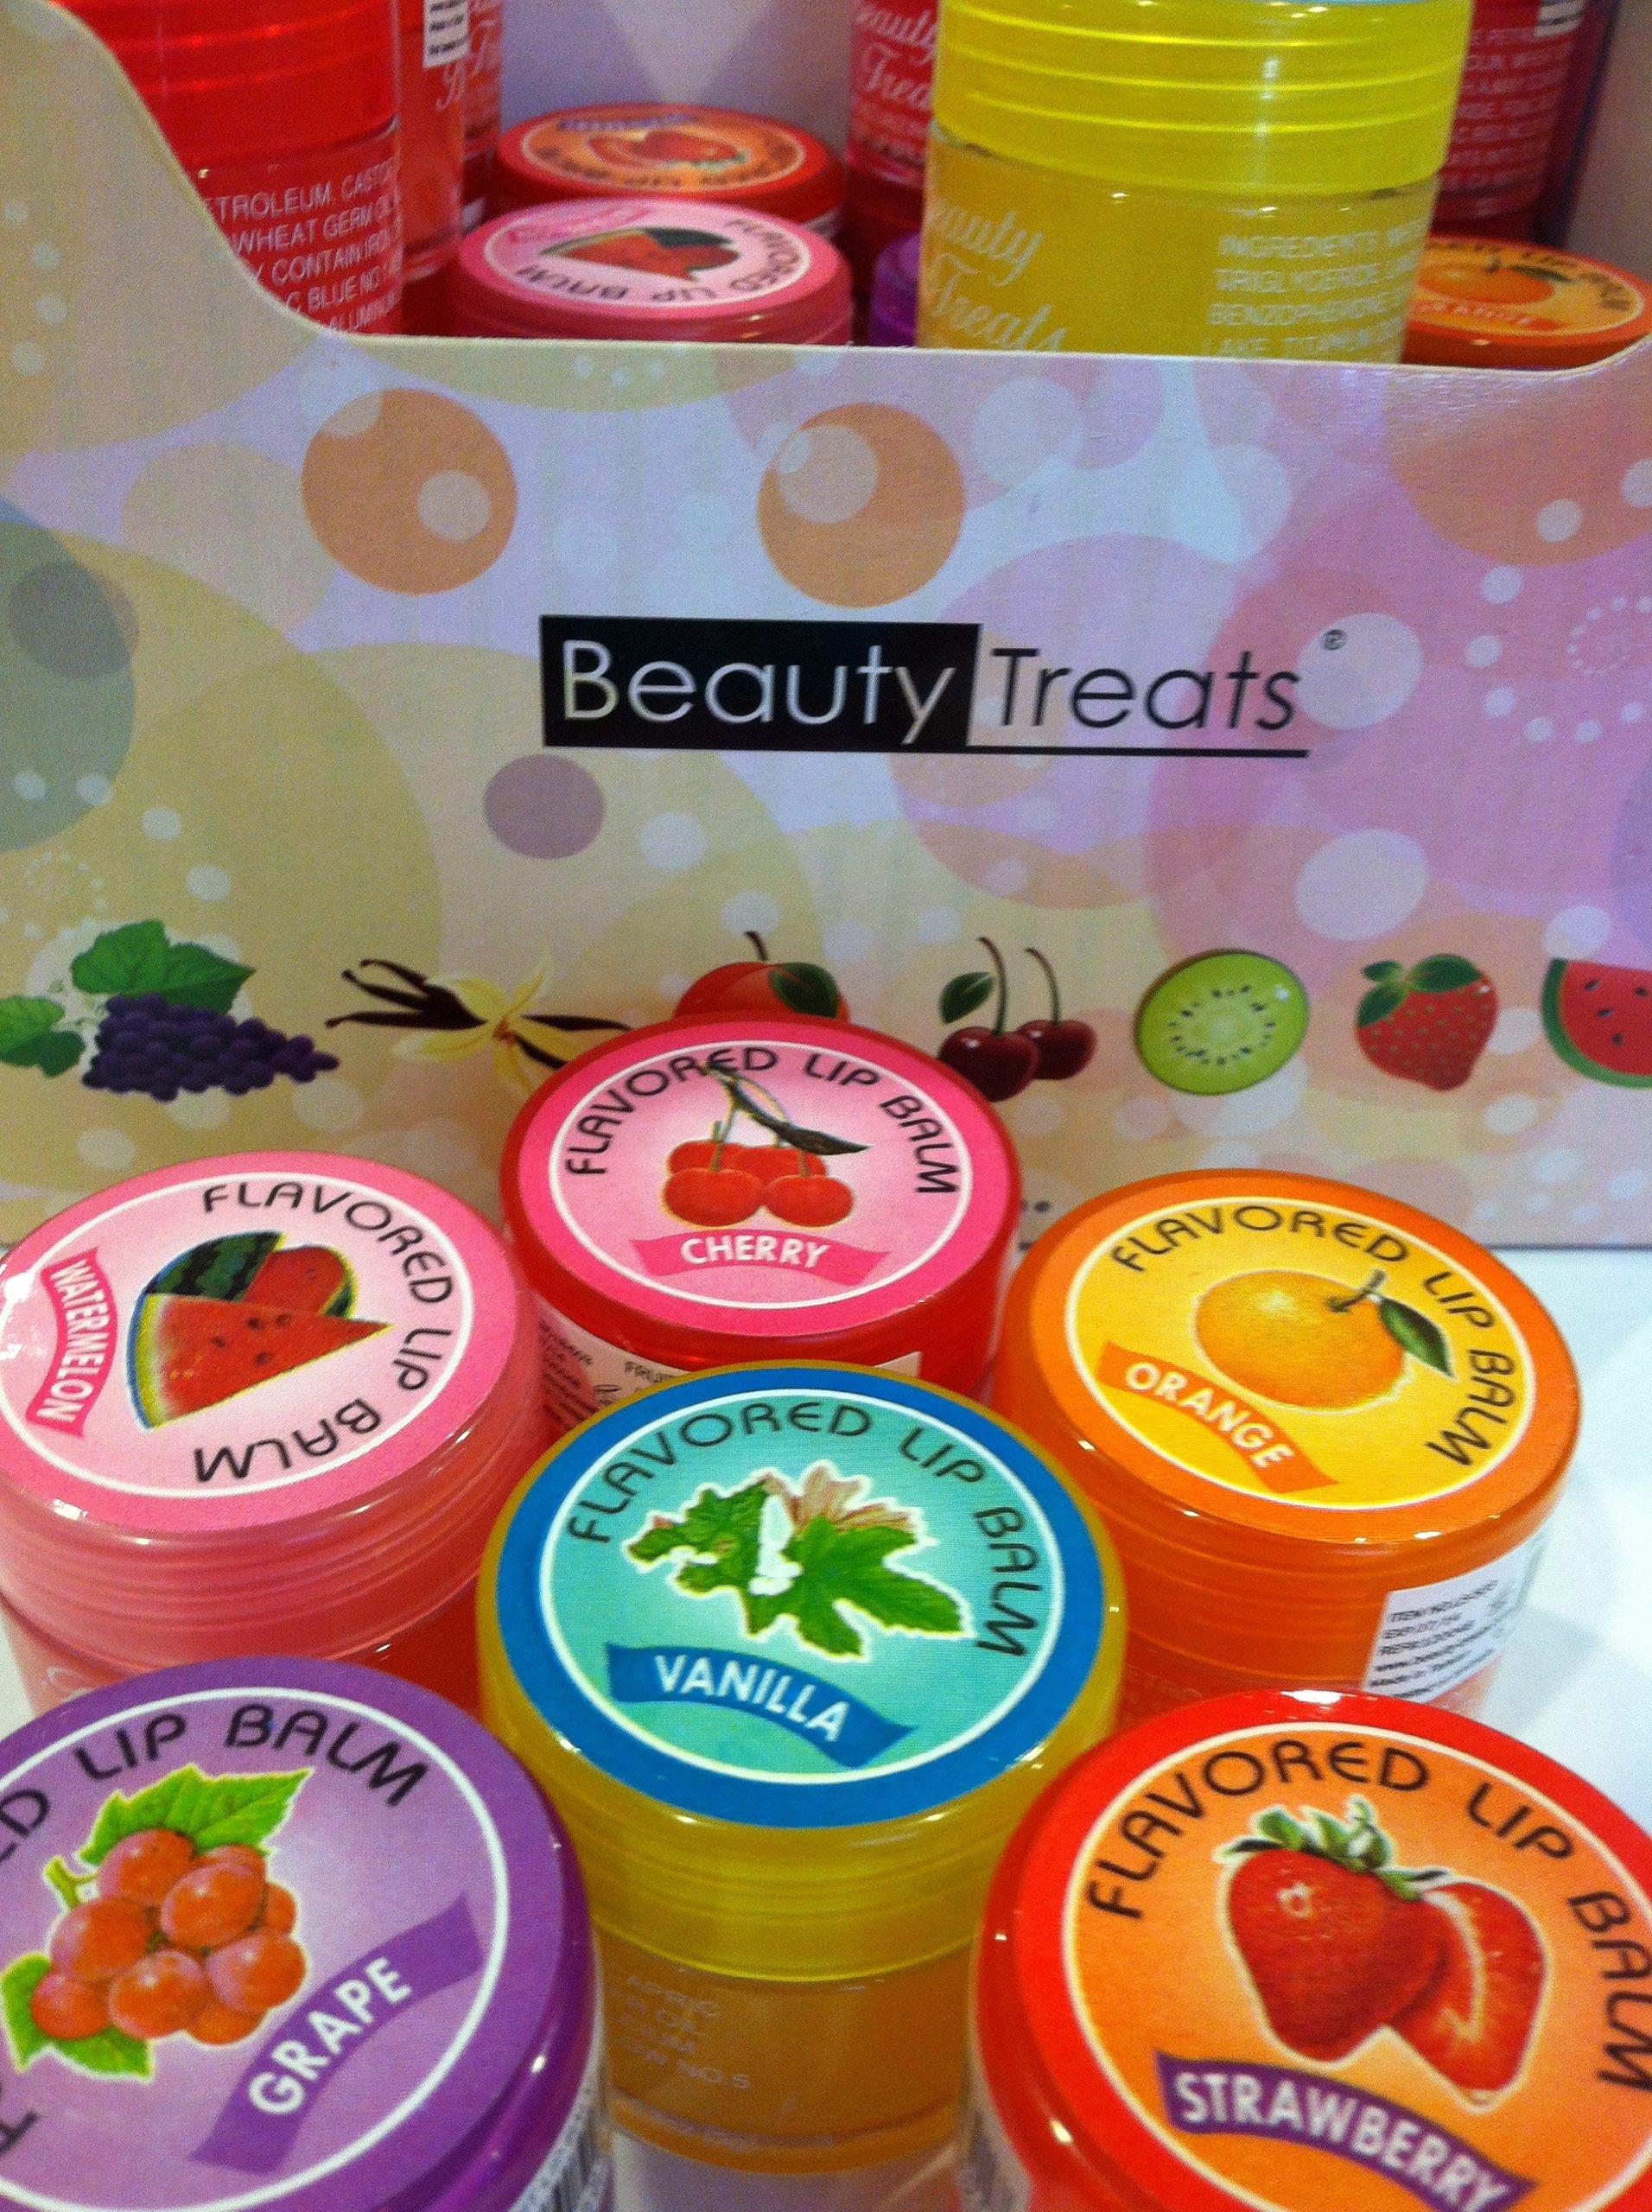 Beauty Treats Flavored Fruit Lip Balm 6 Different Flavors